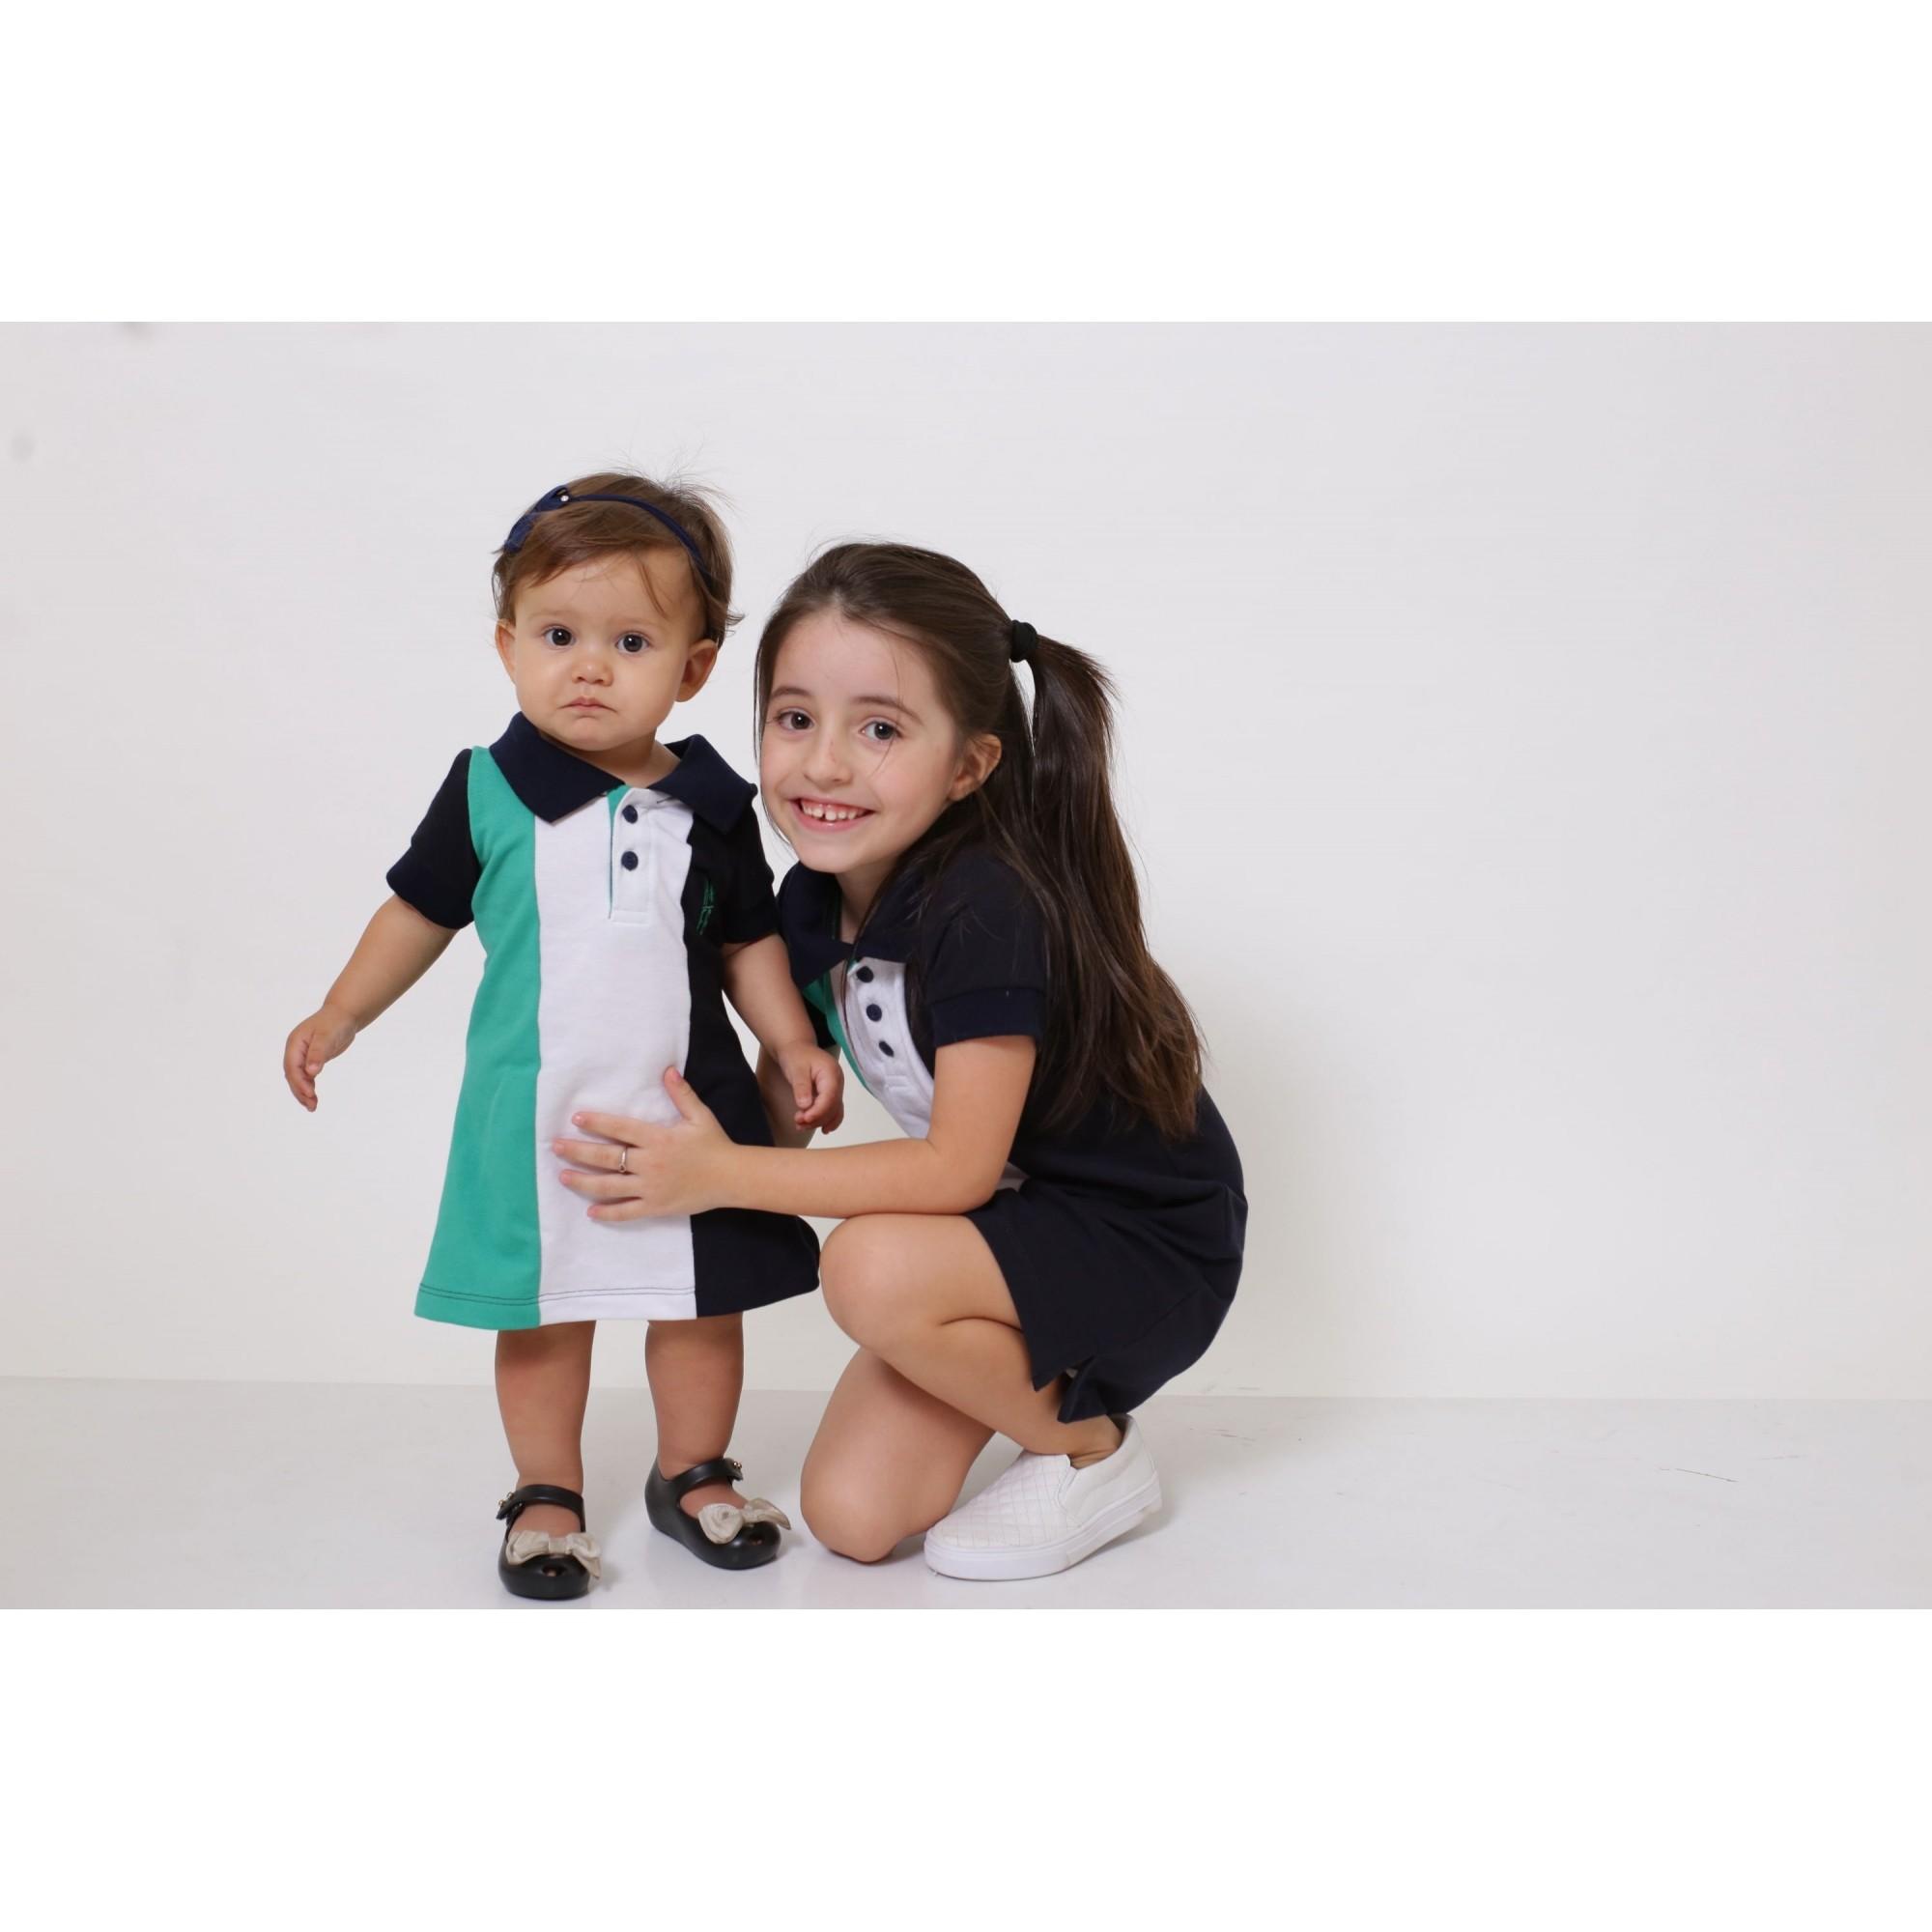 MÃE E FILHA > Kit 02 Vestidos Adulto e Infantil - Listrados Prince [Coleção Tal Mãe Tal Filha]  - Heitor Fashion Brazil